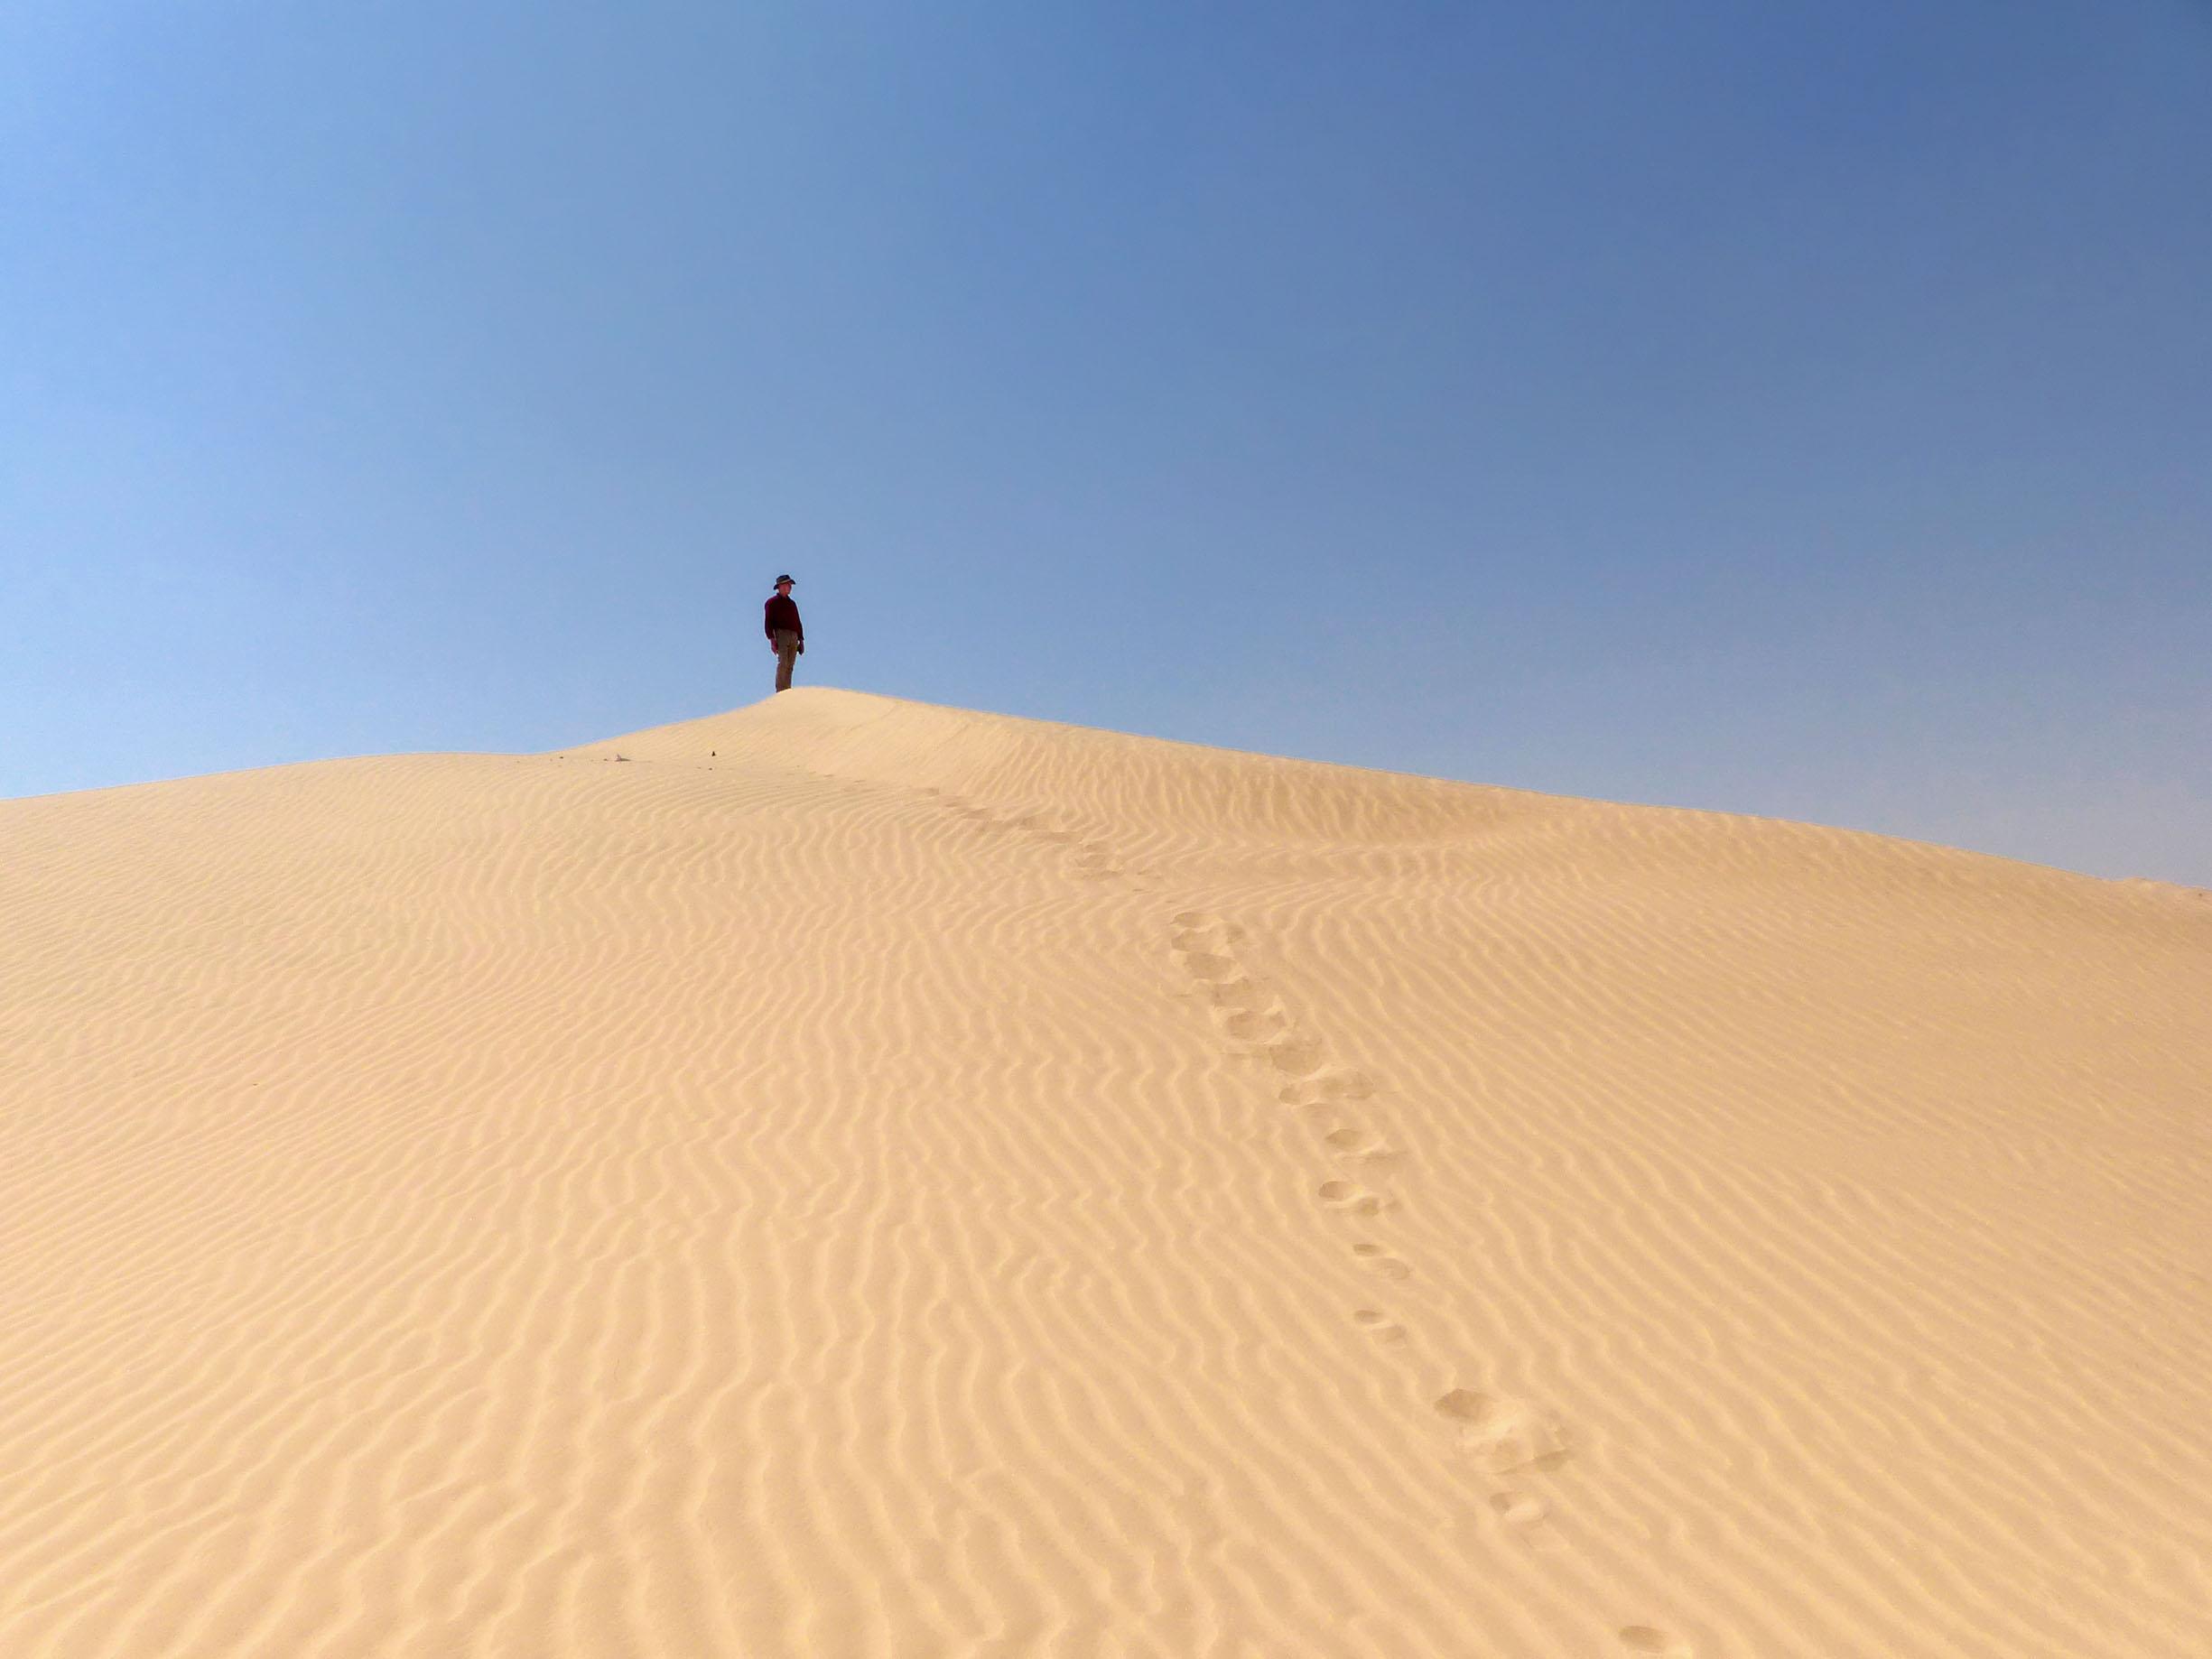 Small figure standing on sand dune